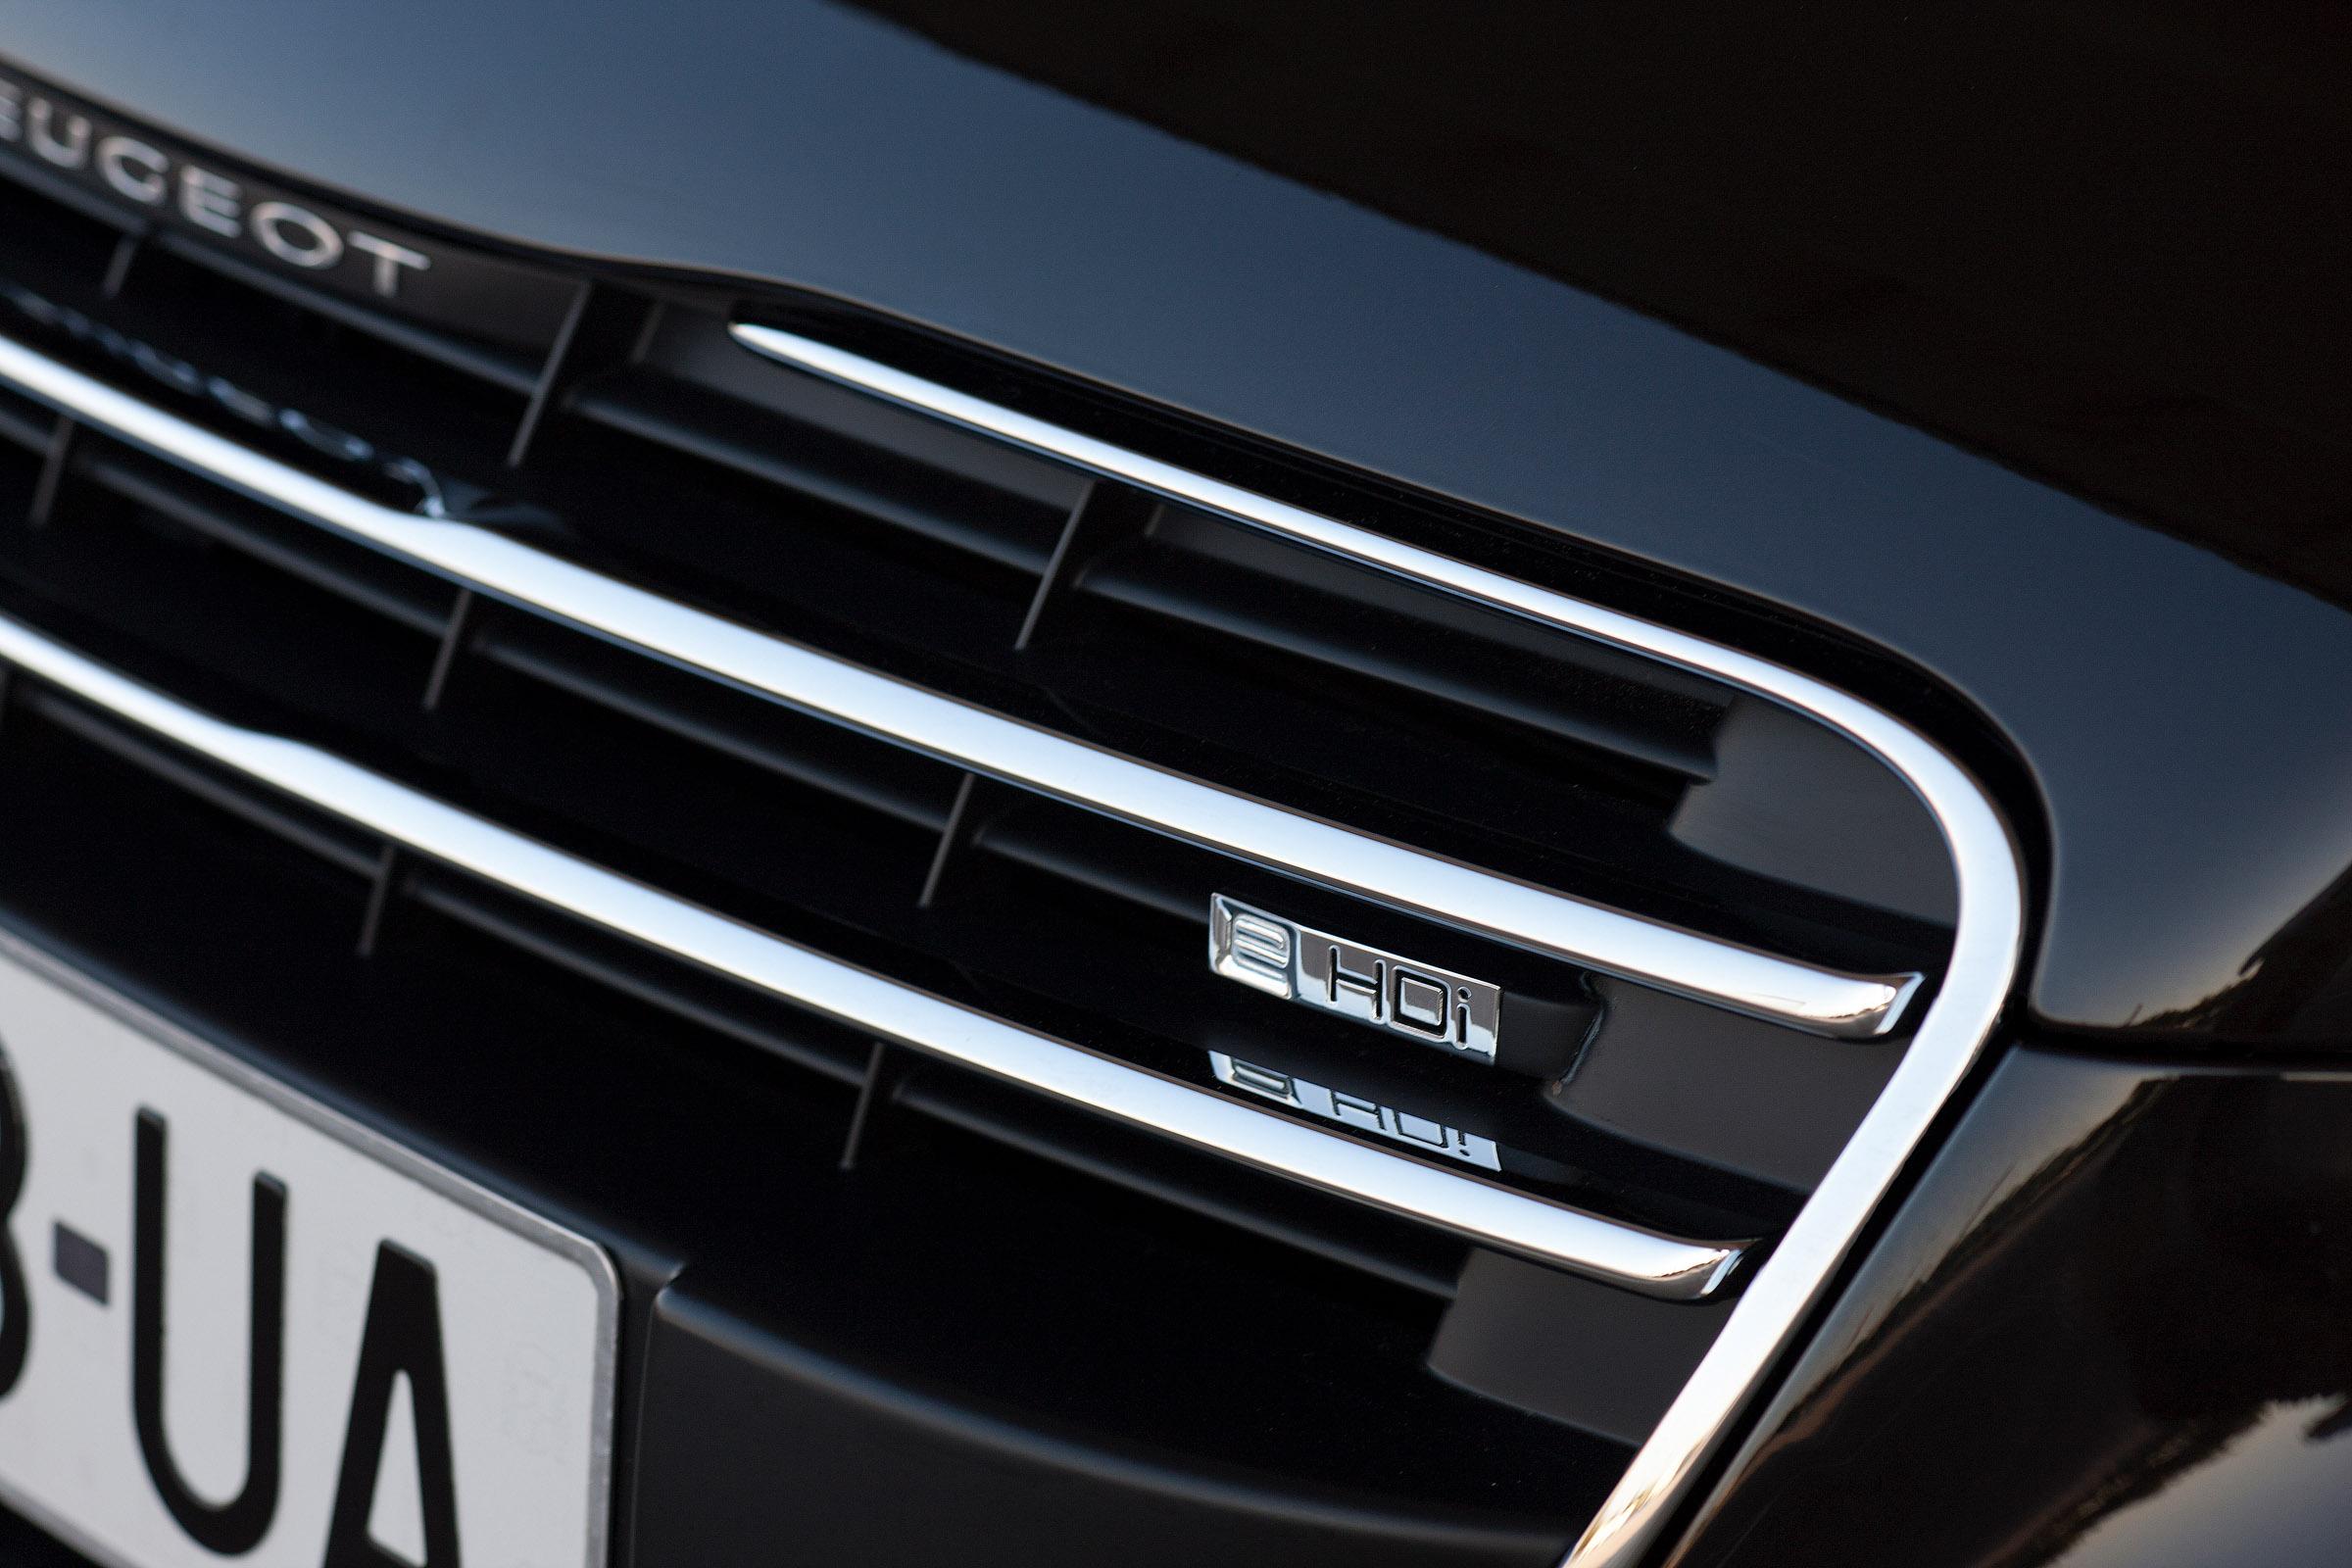 2011 Peugeot 508 Sw Picture 51968